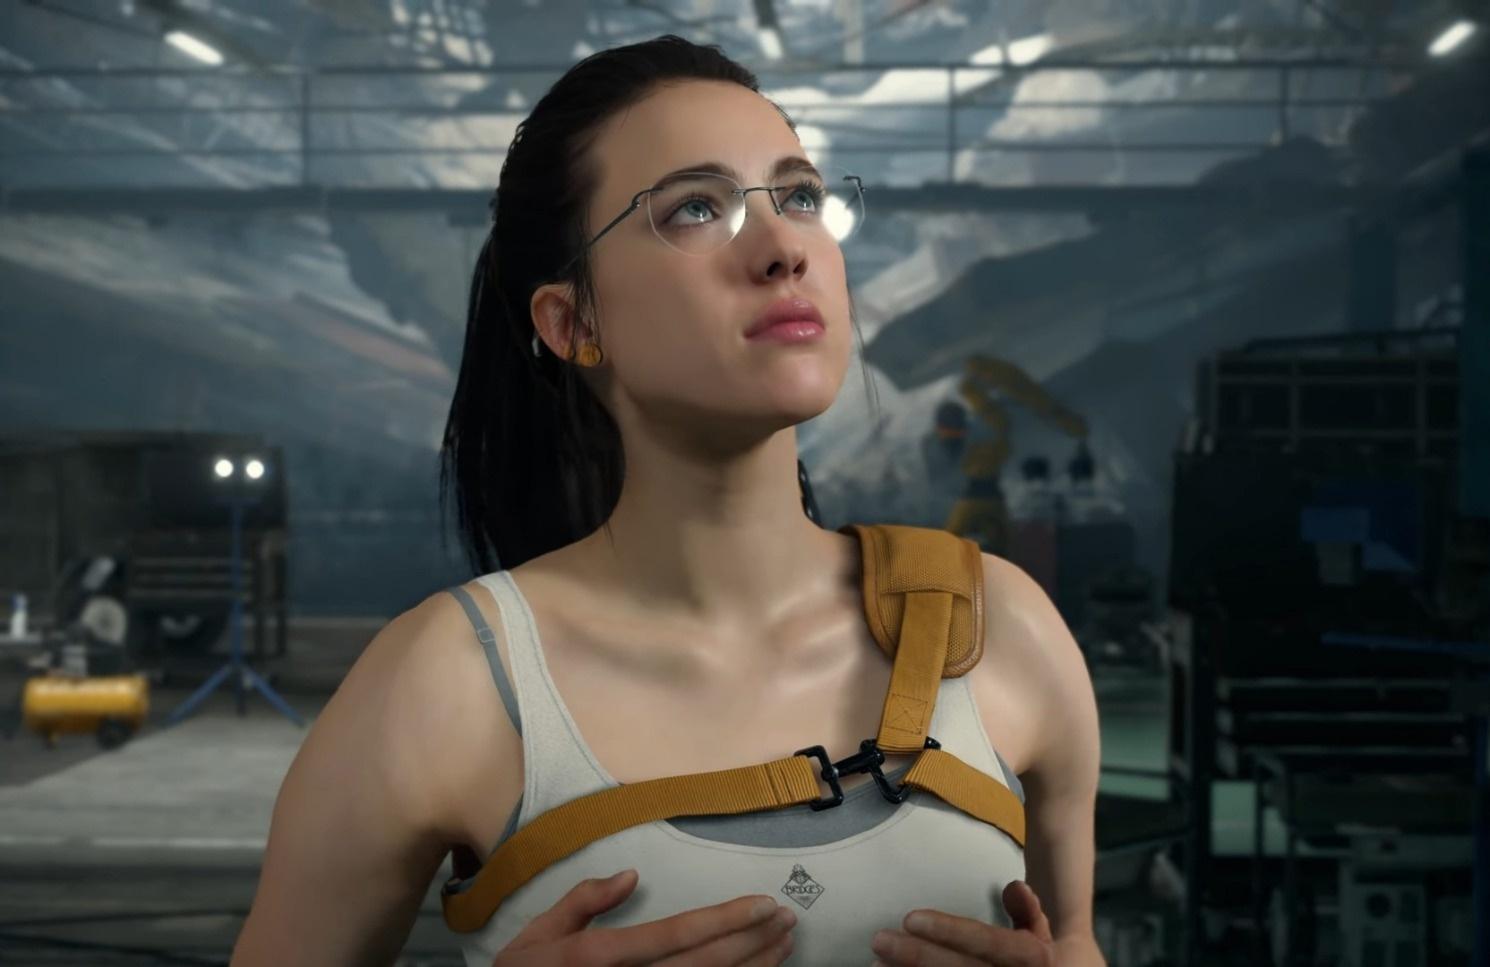 Review Death Stranding PC PS4 Media Formasi Karakter Aktor 4 Cewe Megane Kacamata